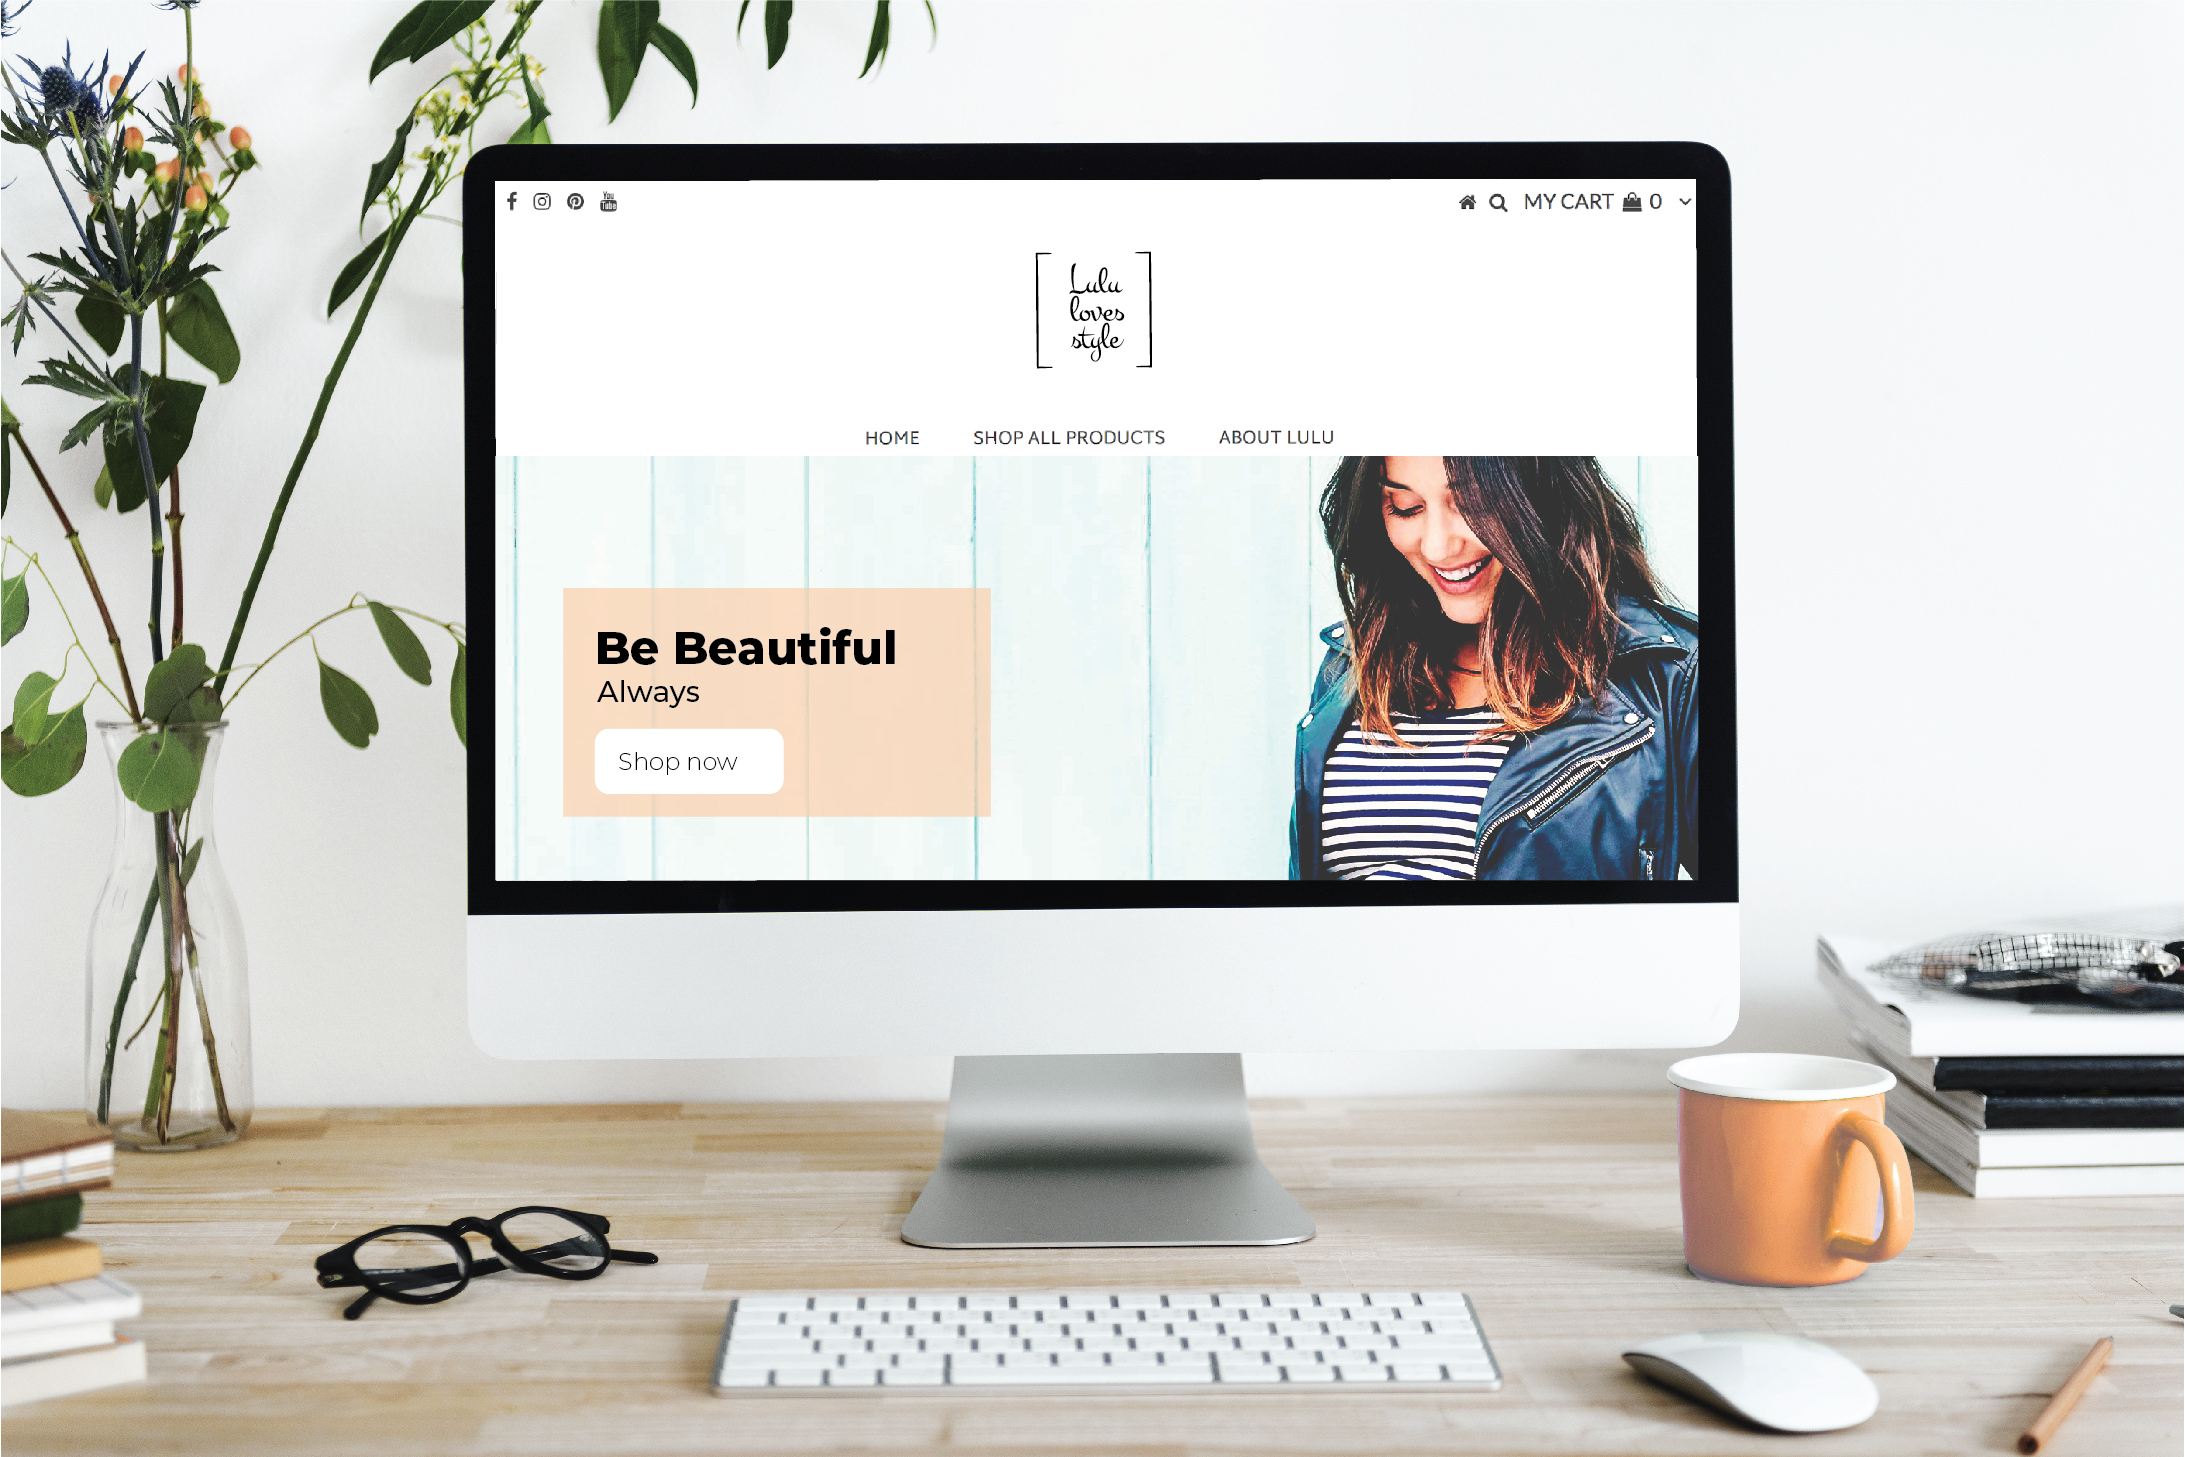 Lulu Loves Style website design